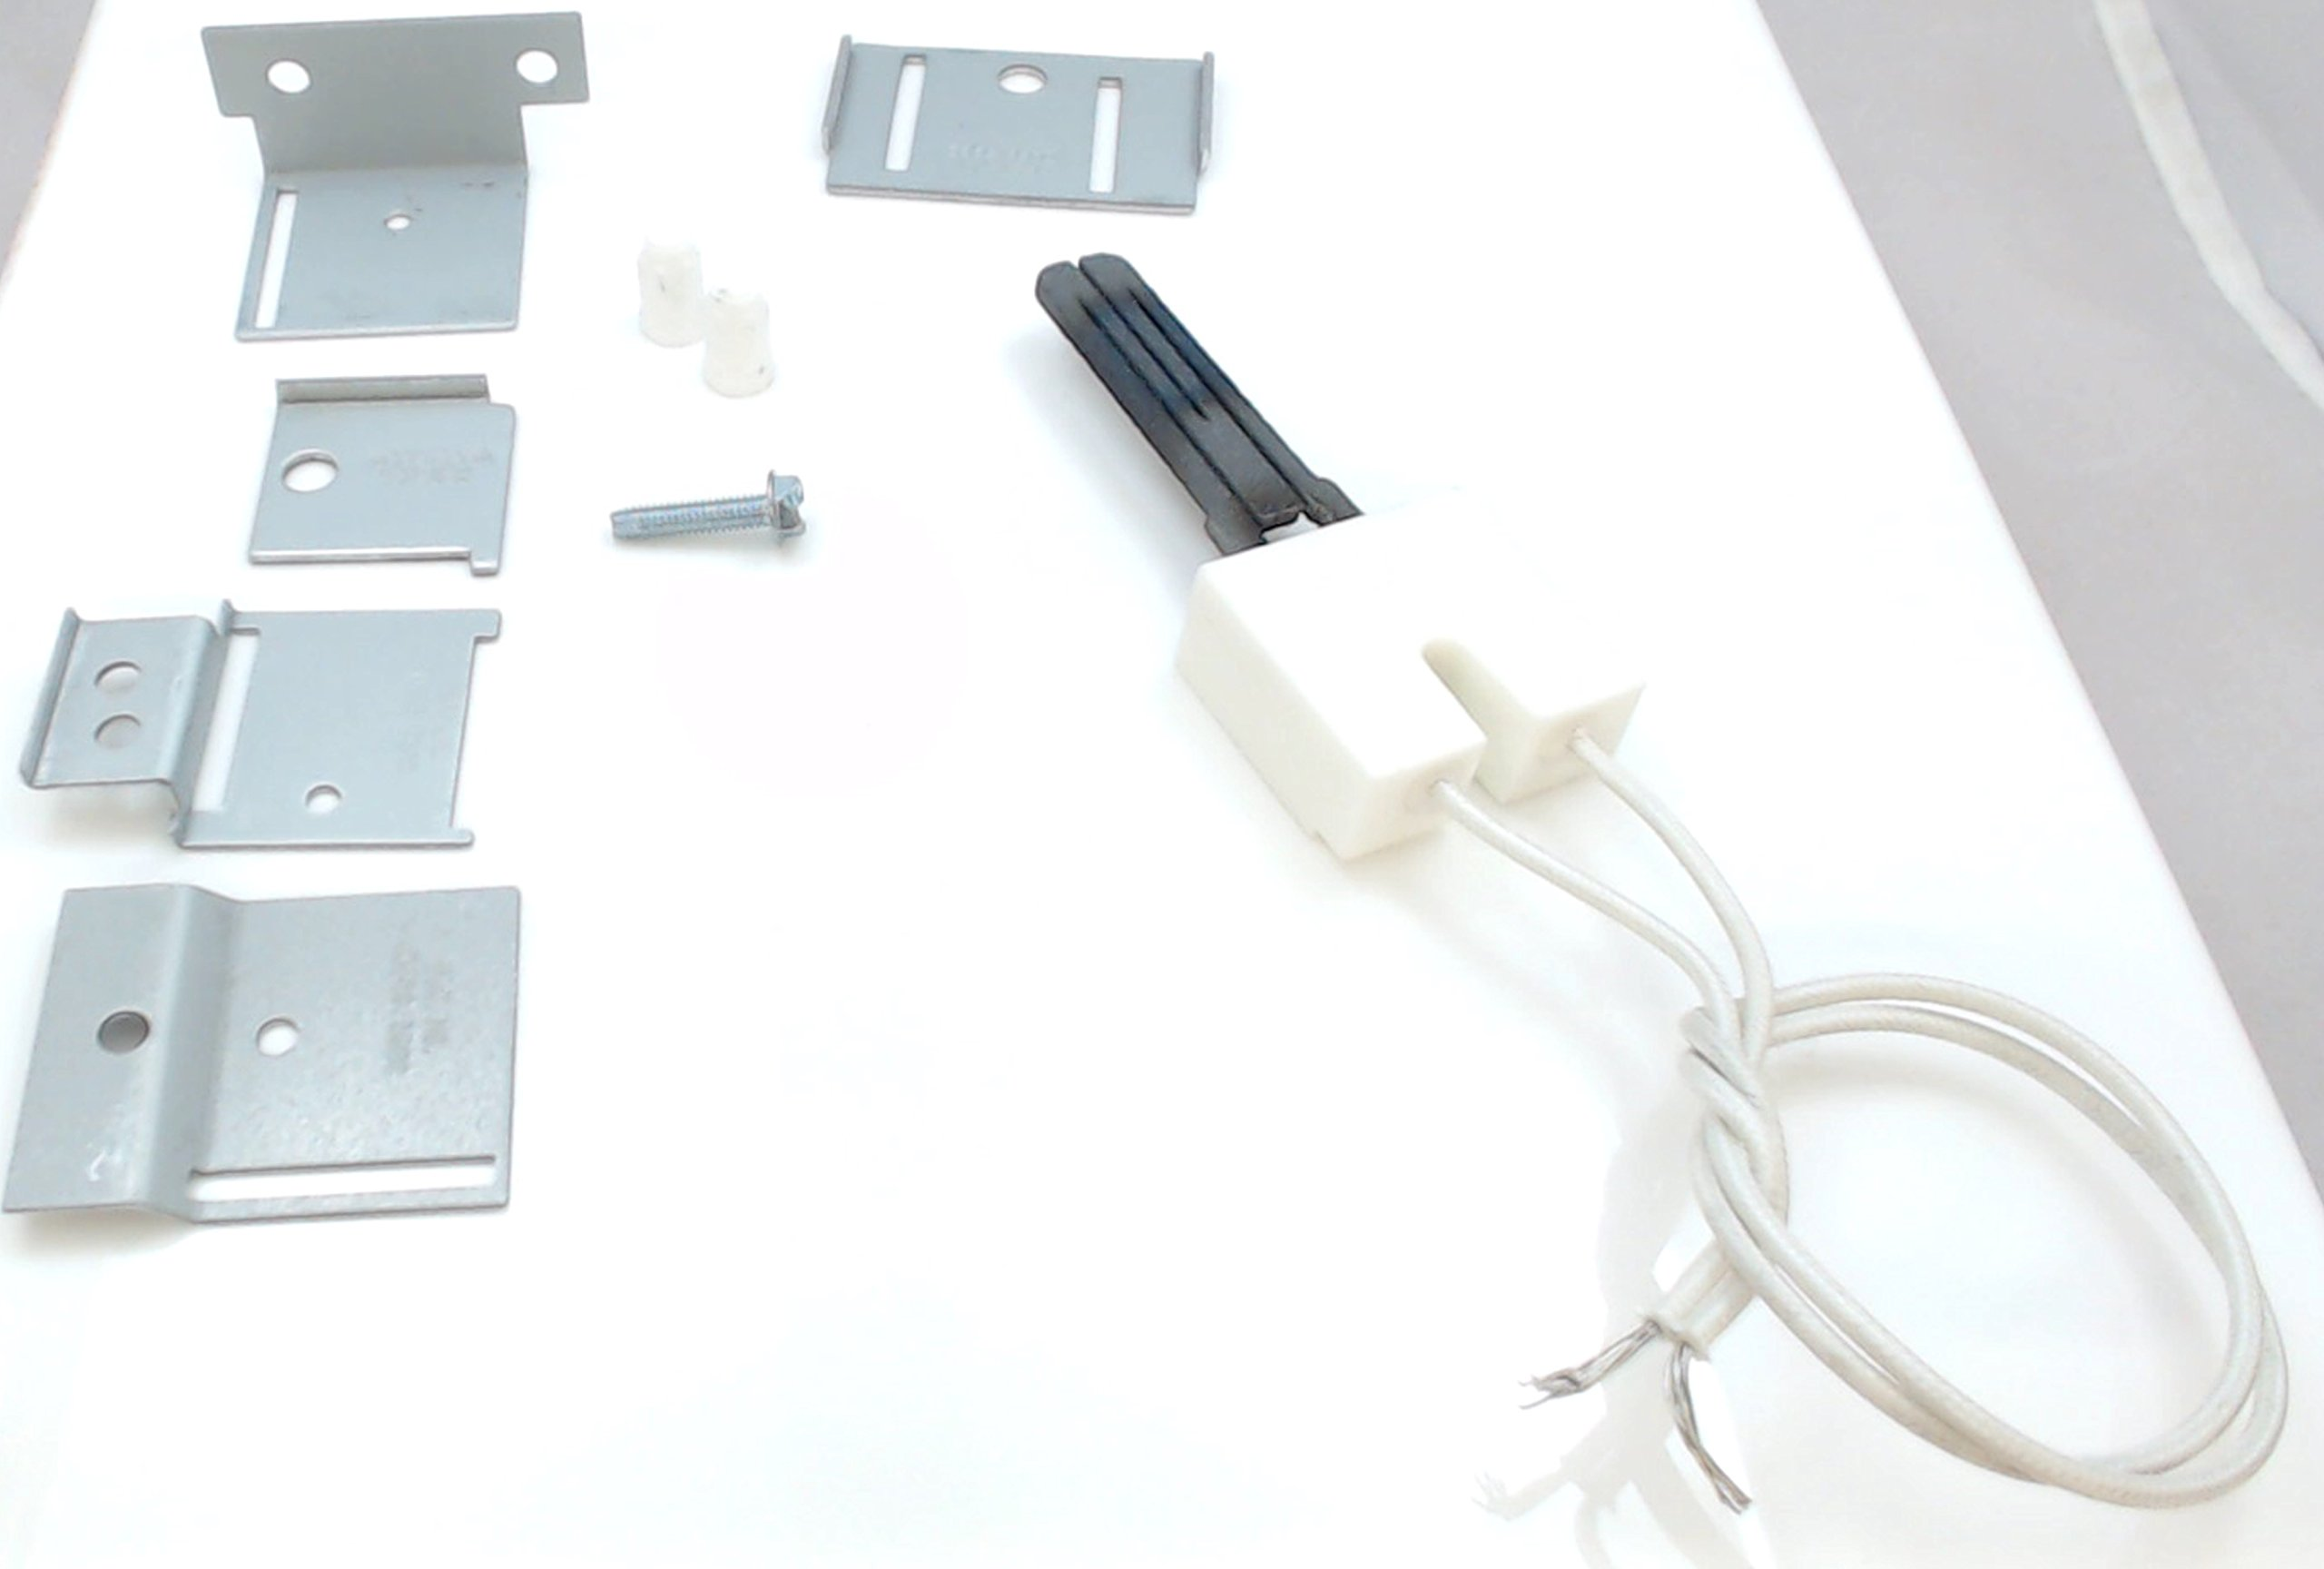 Universal Flat Furnace Igniter Super Kit, IG4000